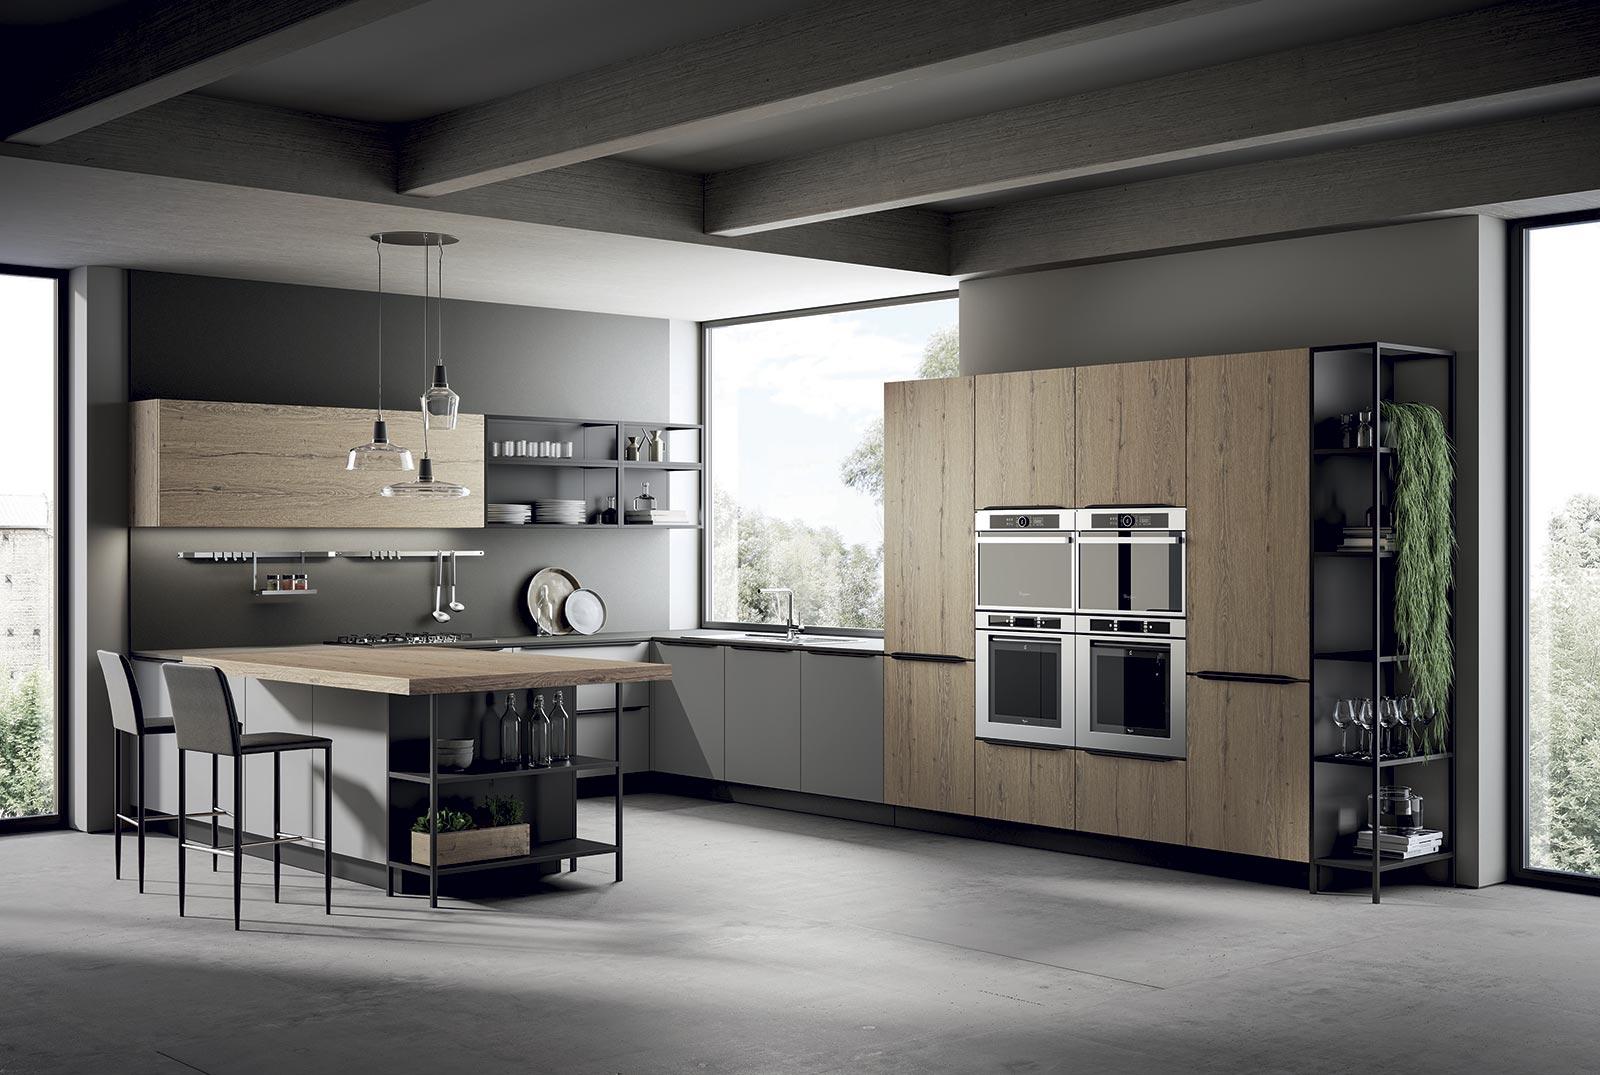 cucina moderna arredo3 kalì